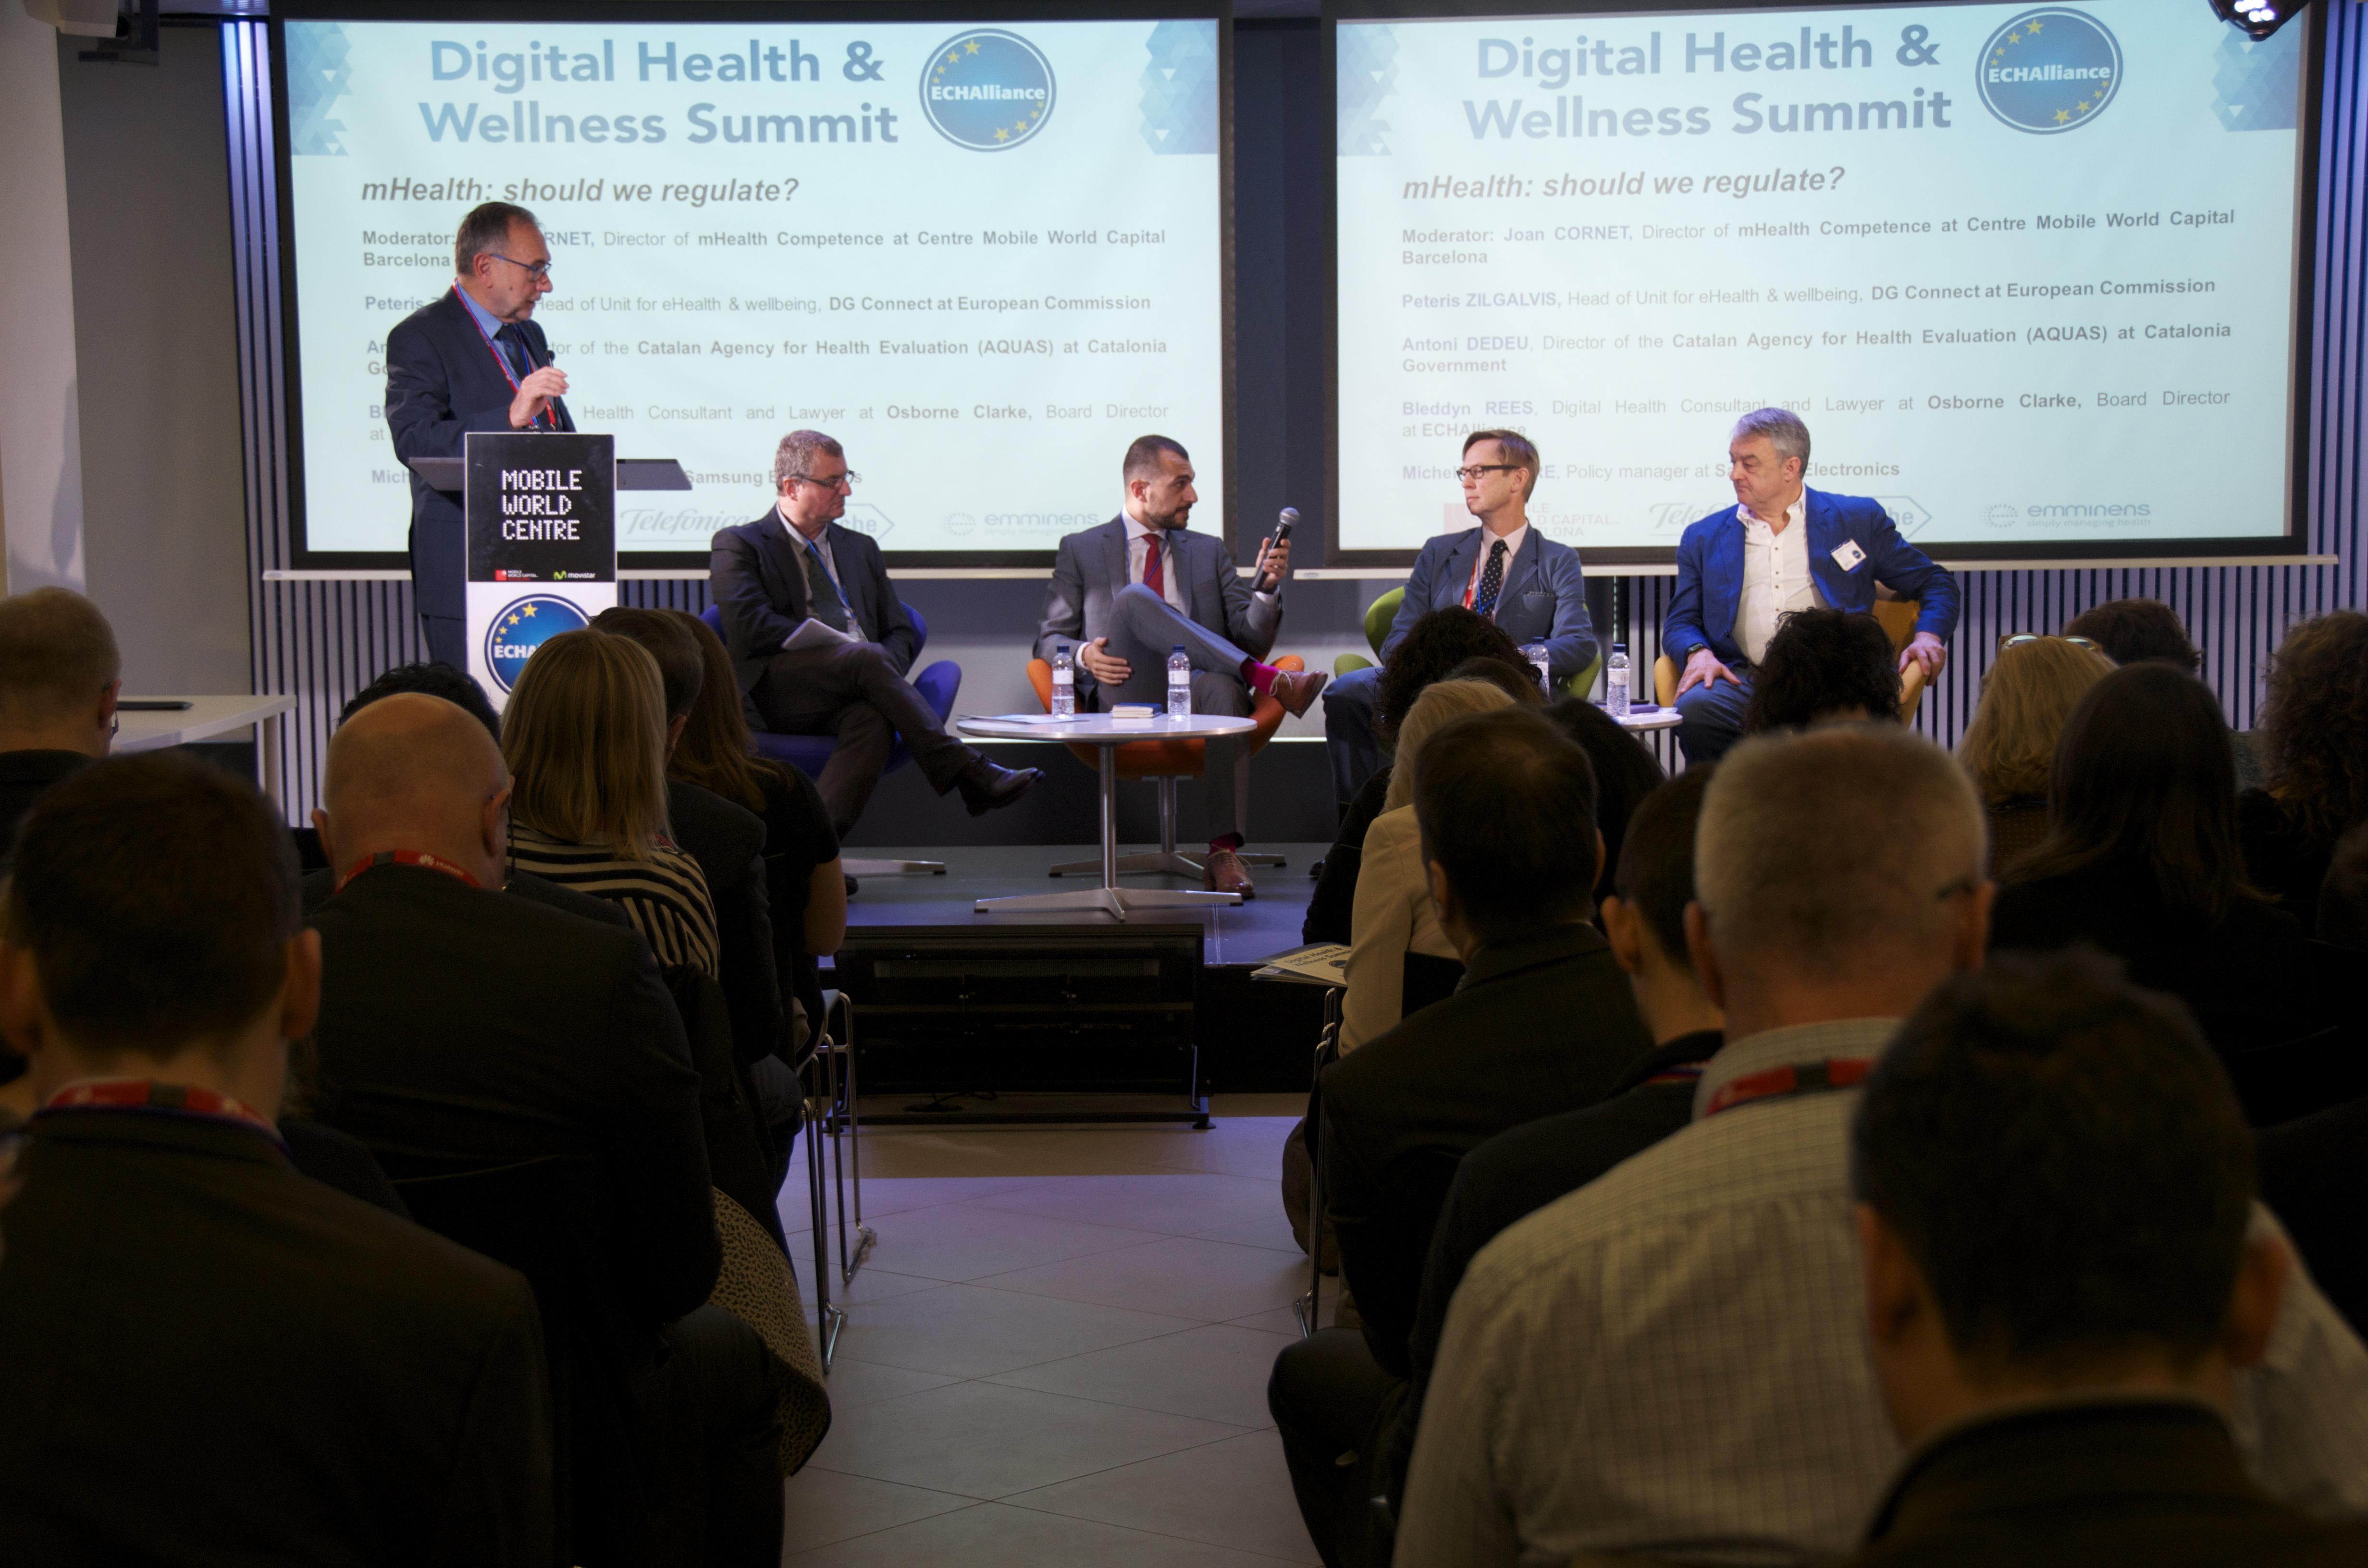 Panel session on regulatory framework of mHealth